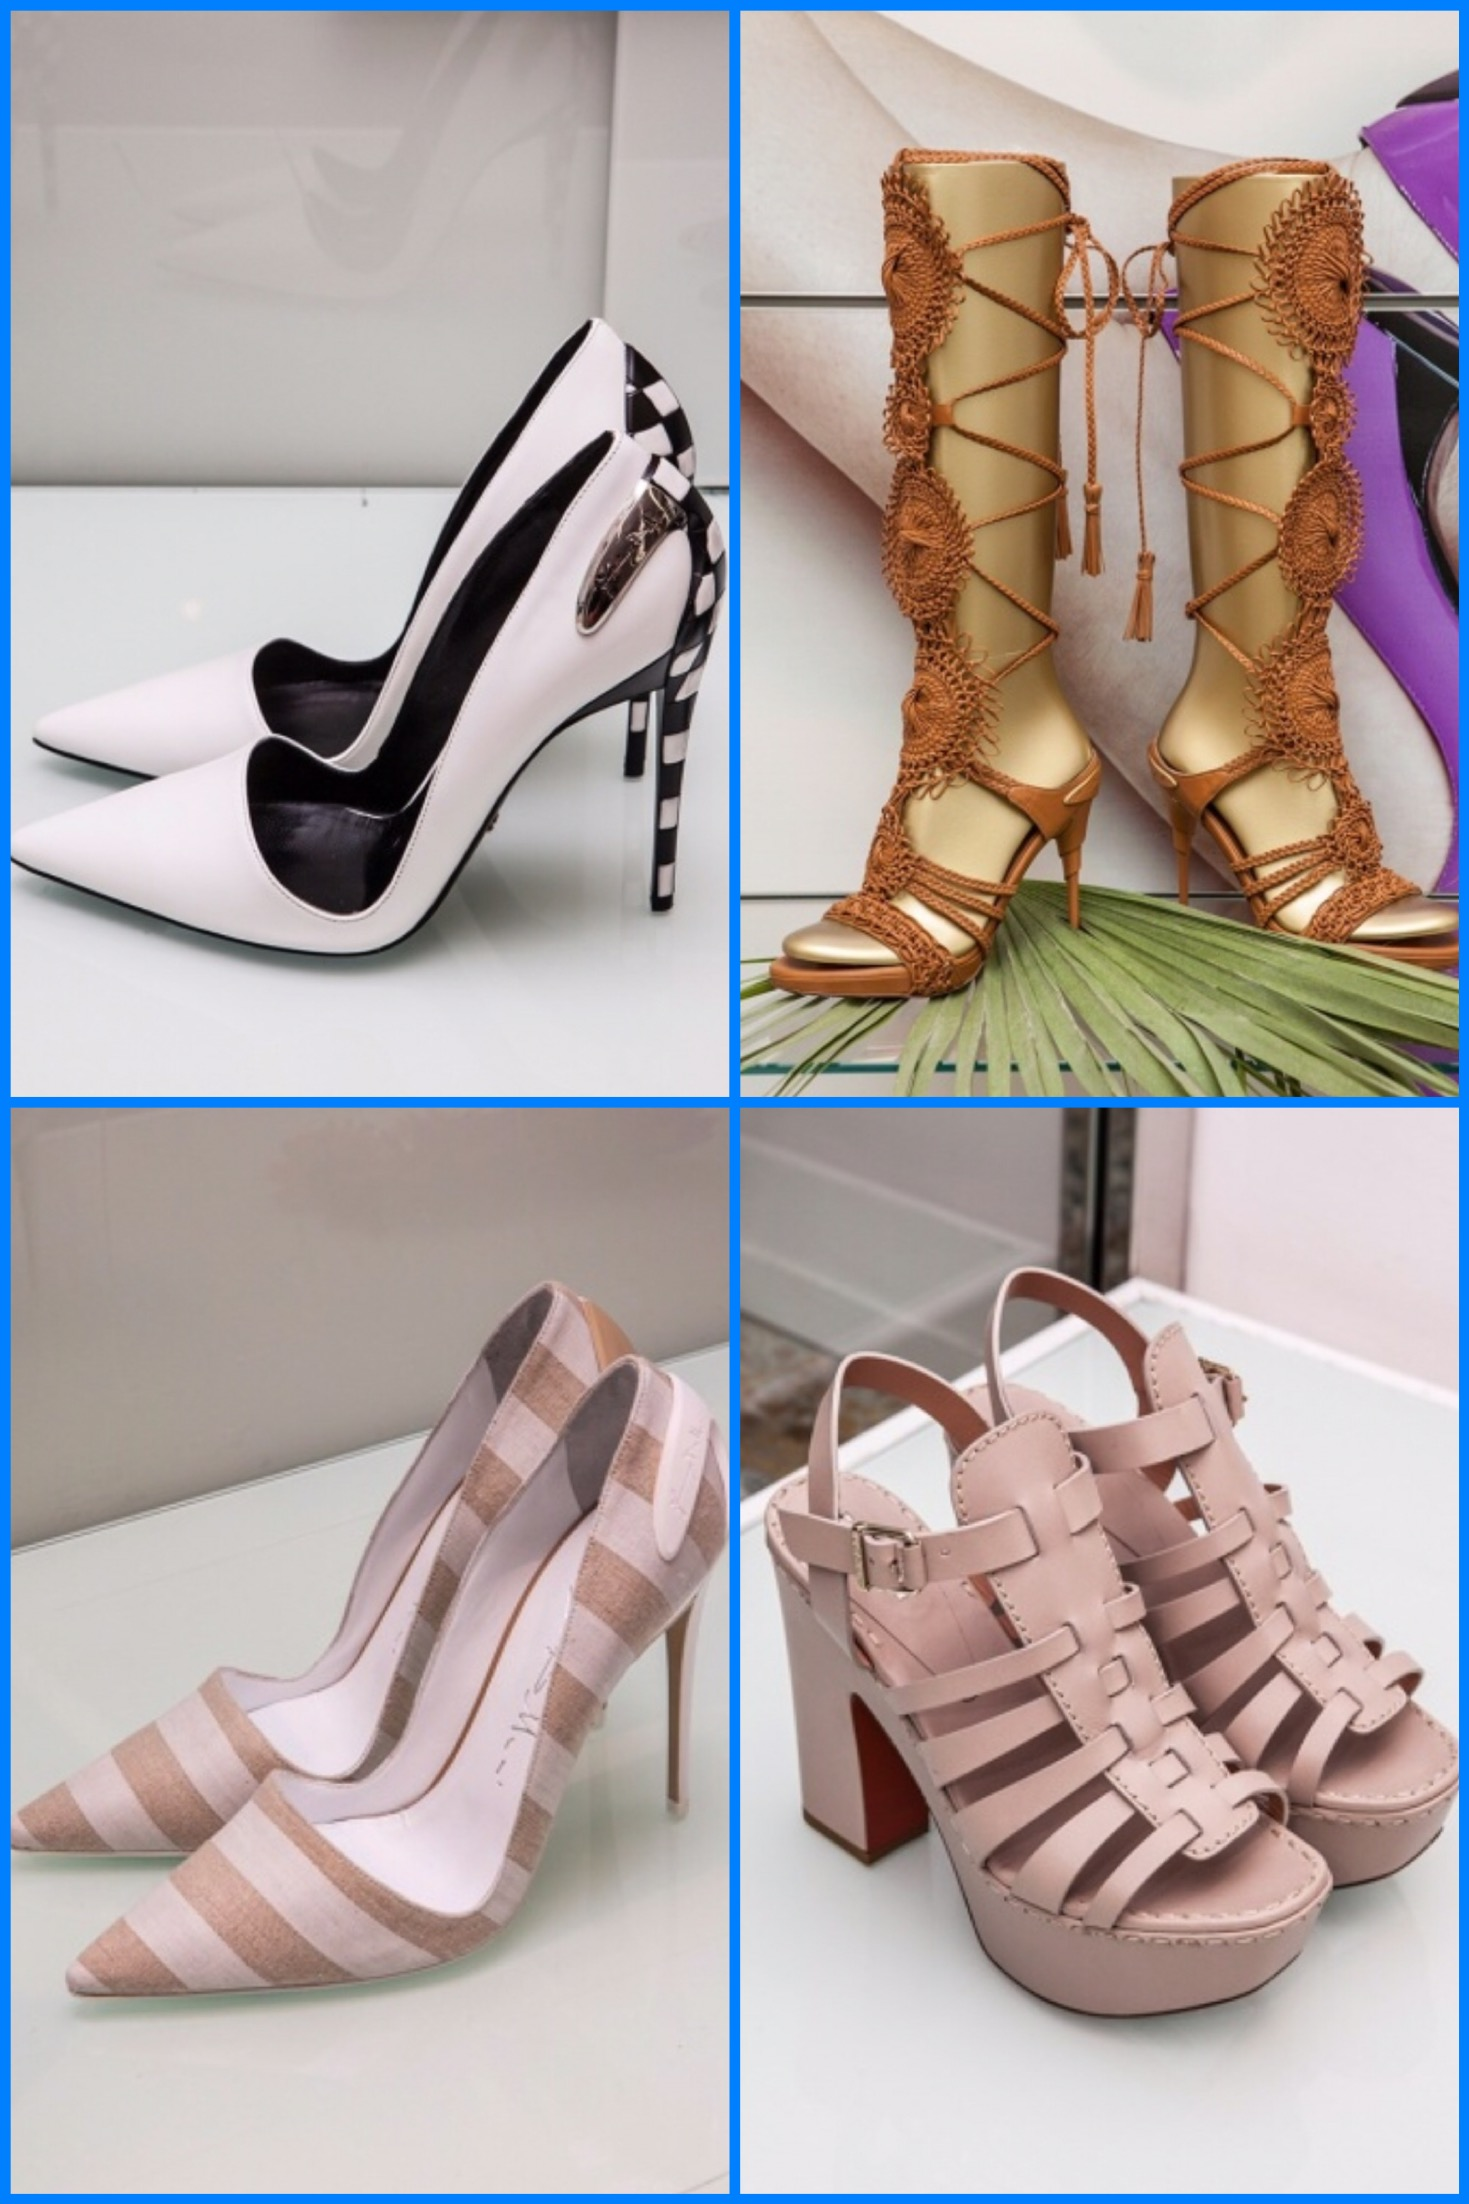 milano-fashion-week-pret-a-porter-spring-summer-2017-style-baldinini